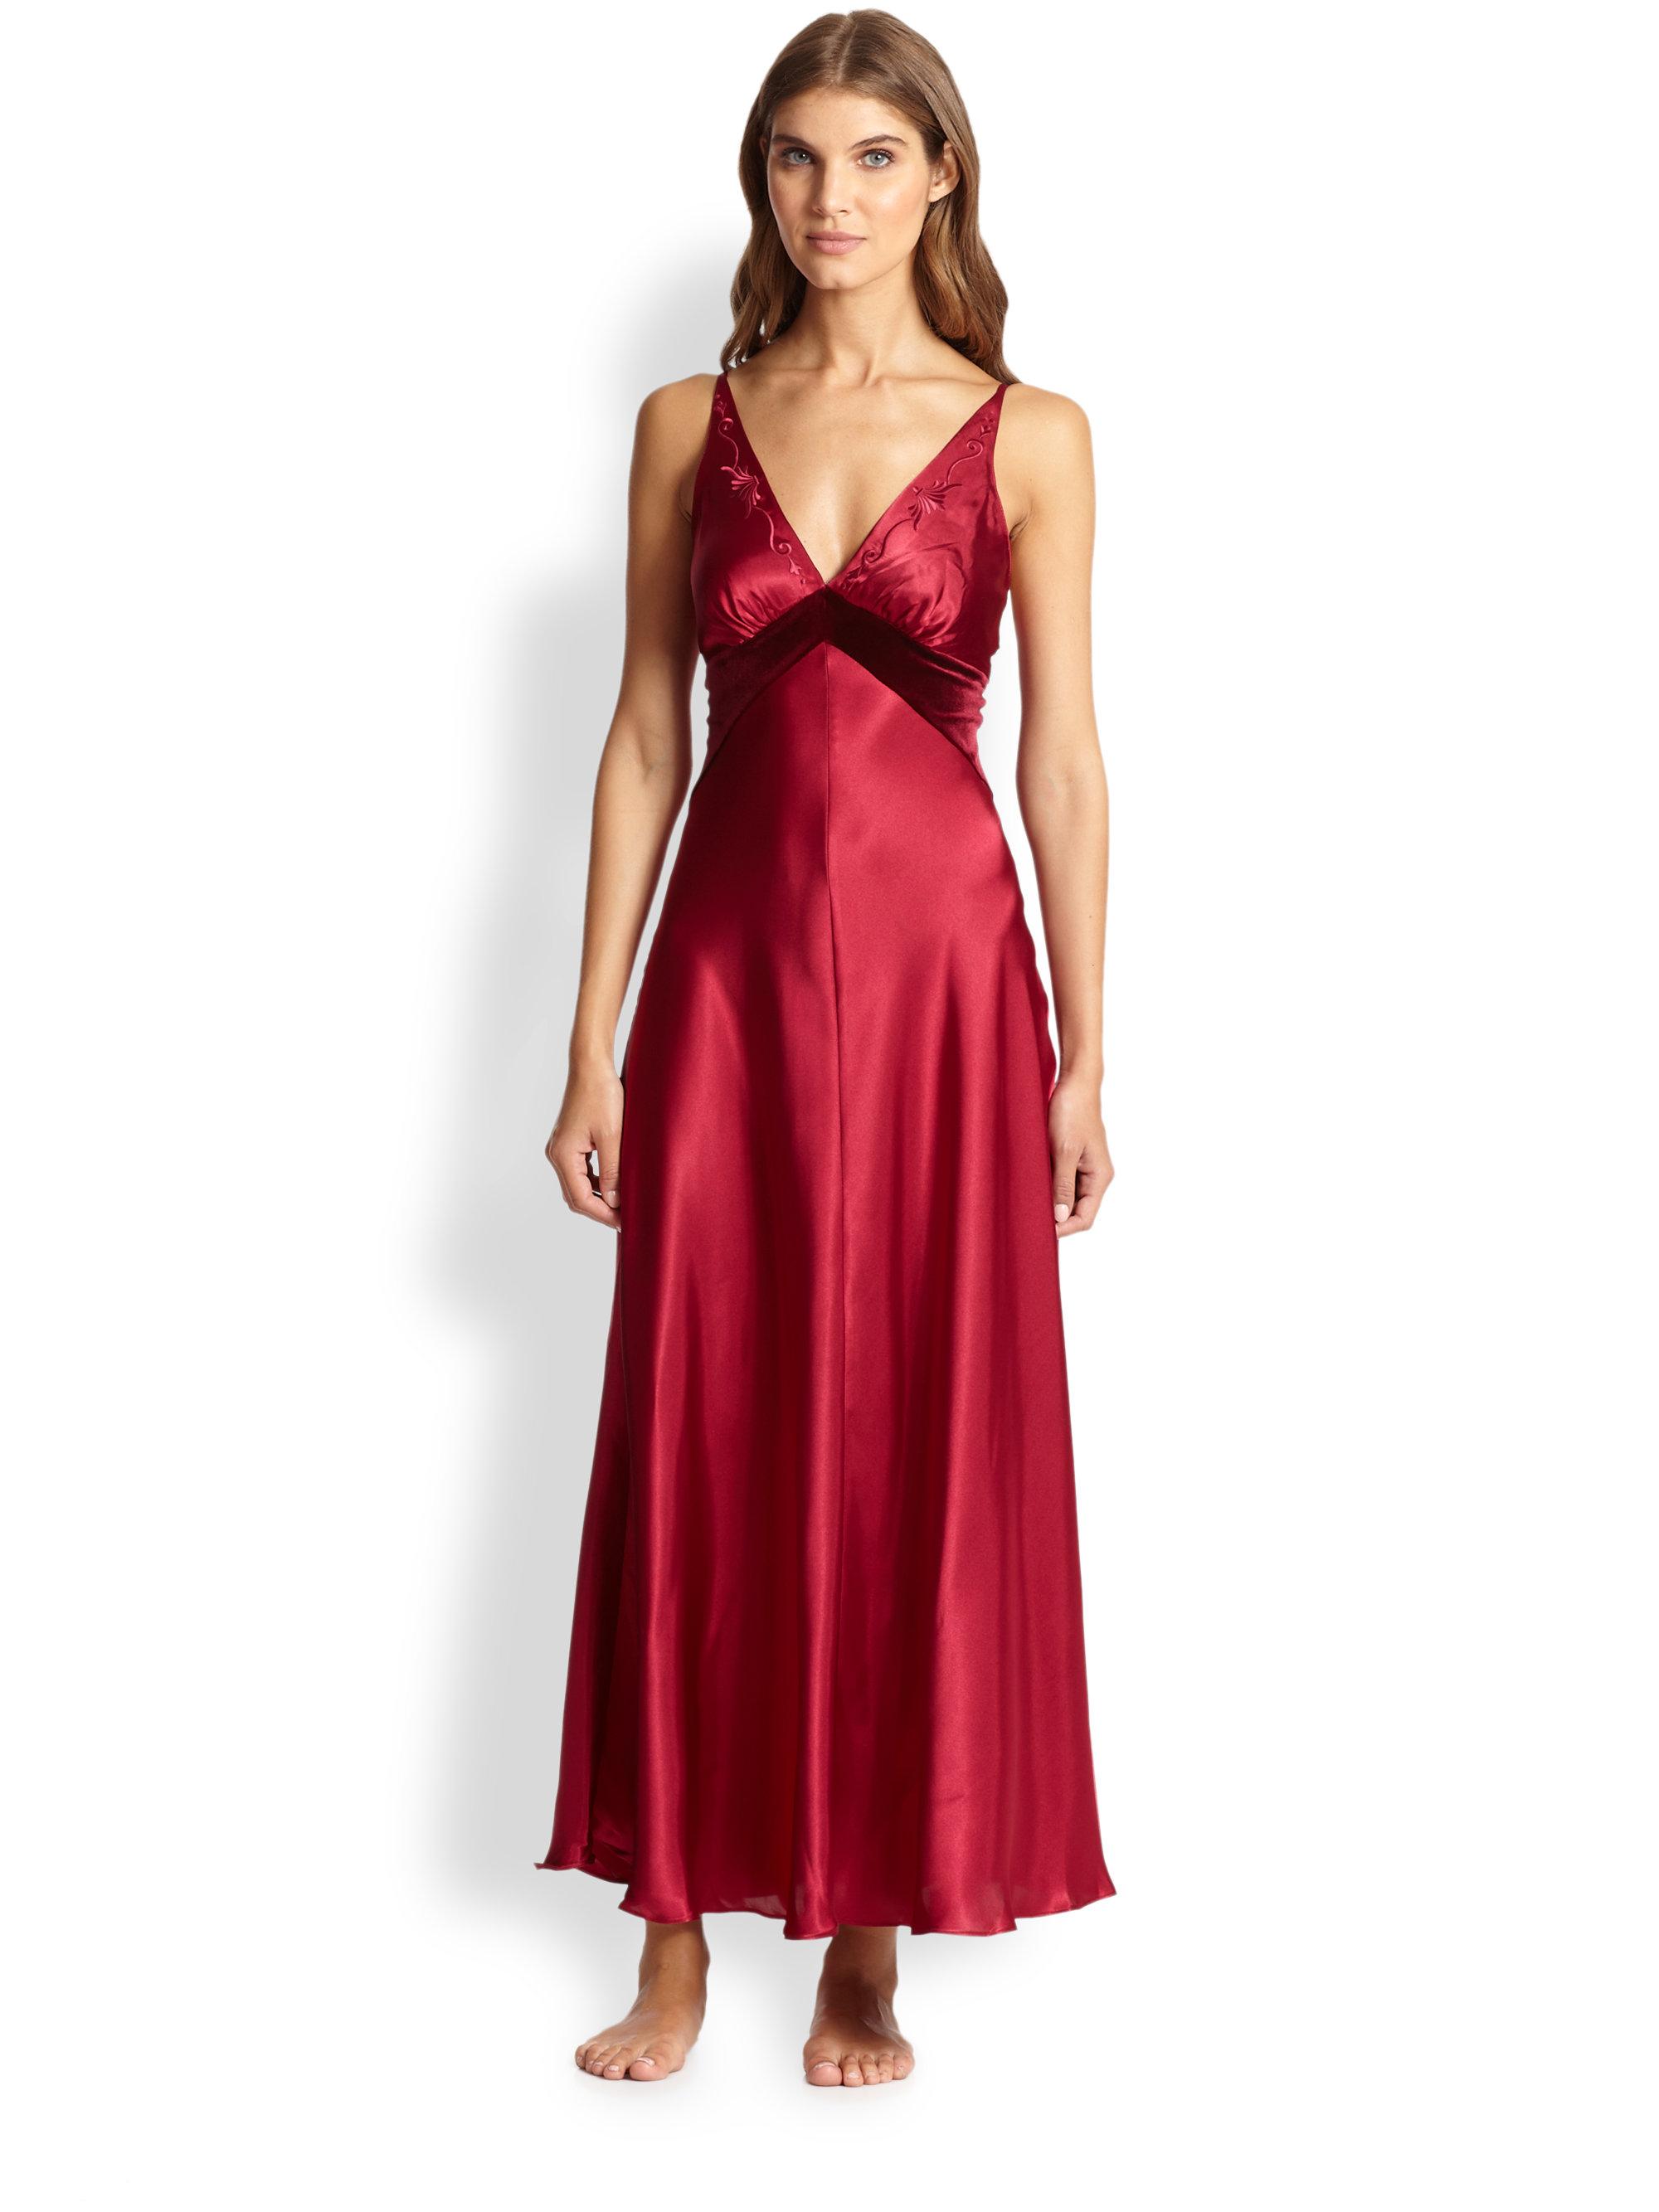 bfec2ddbec Lyst - Jonquil Velvet-Trimmed Satin Long Gown in Red